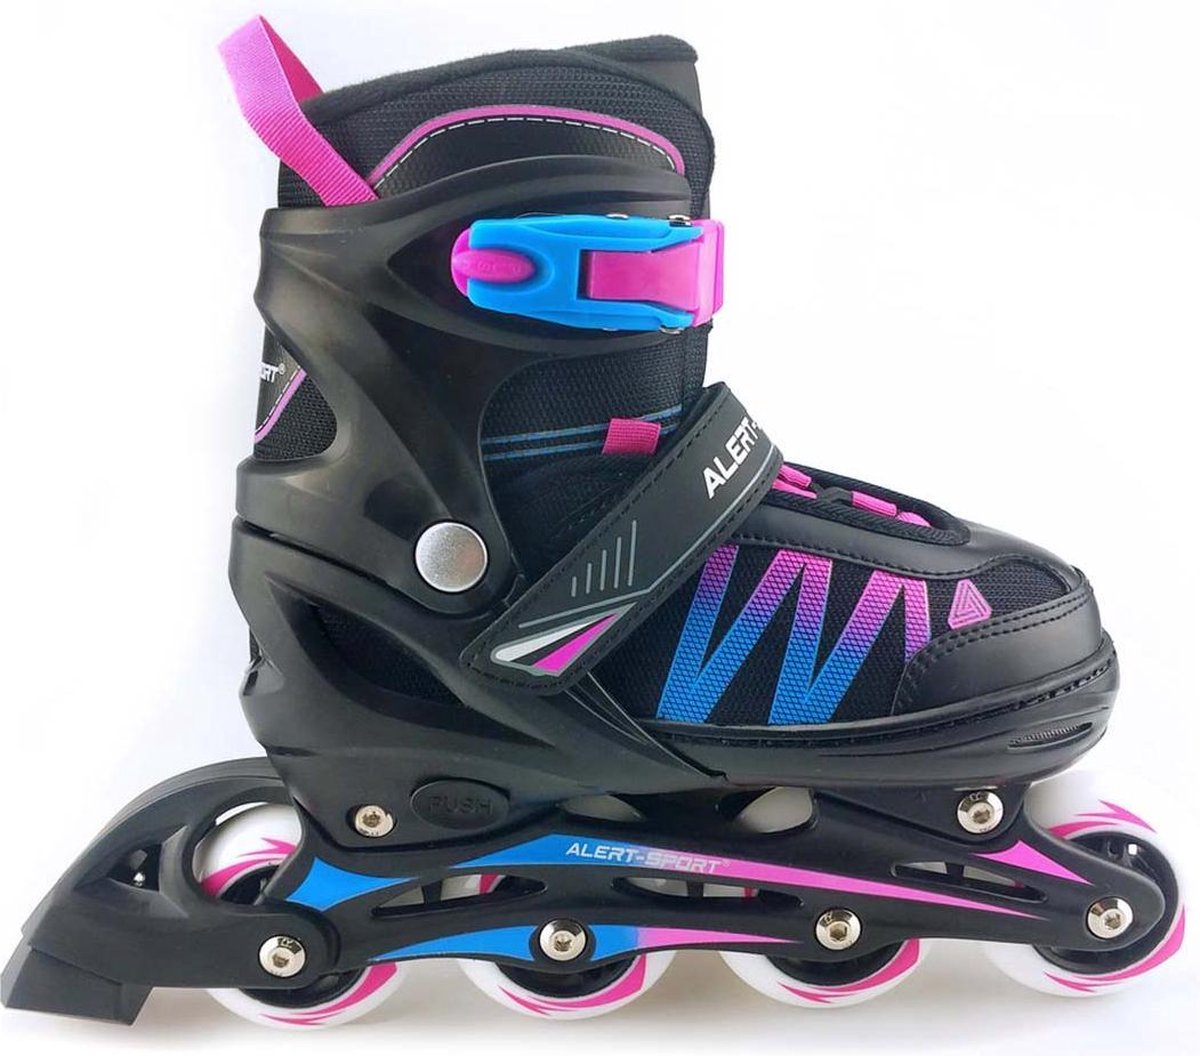 Skates Roze 31-34 - Skates Meisjes - ALERT